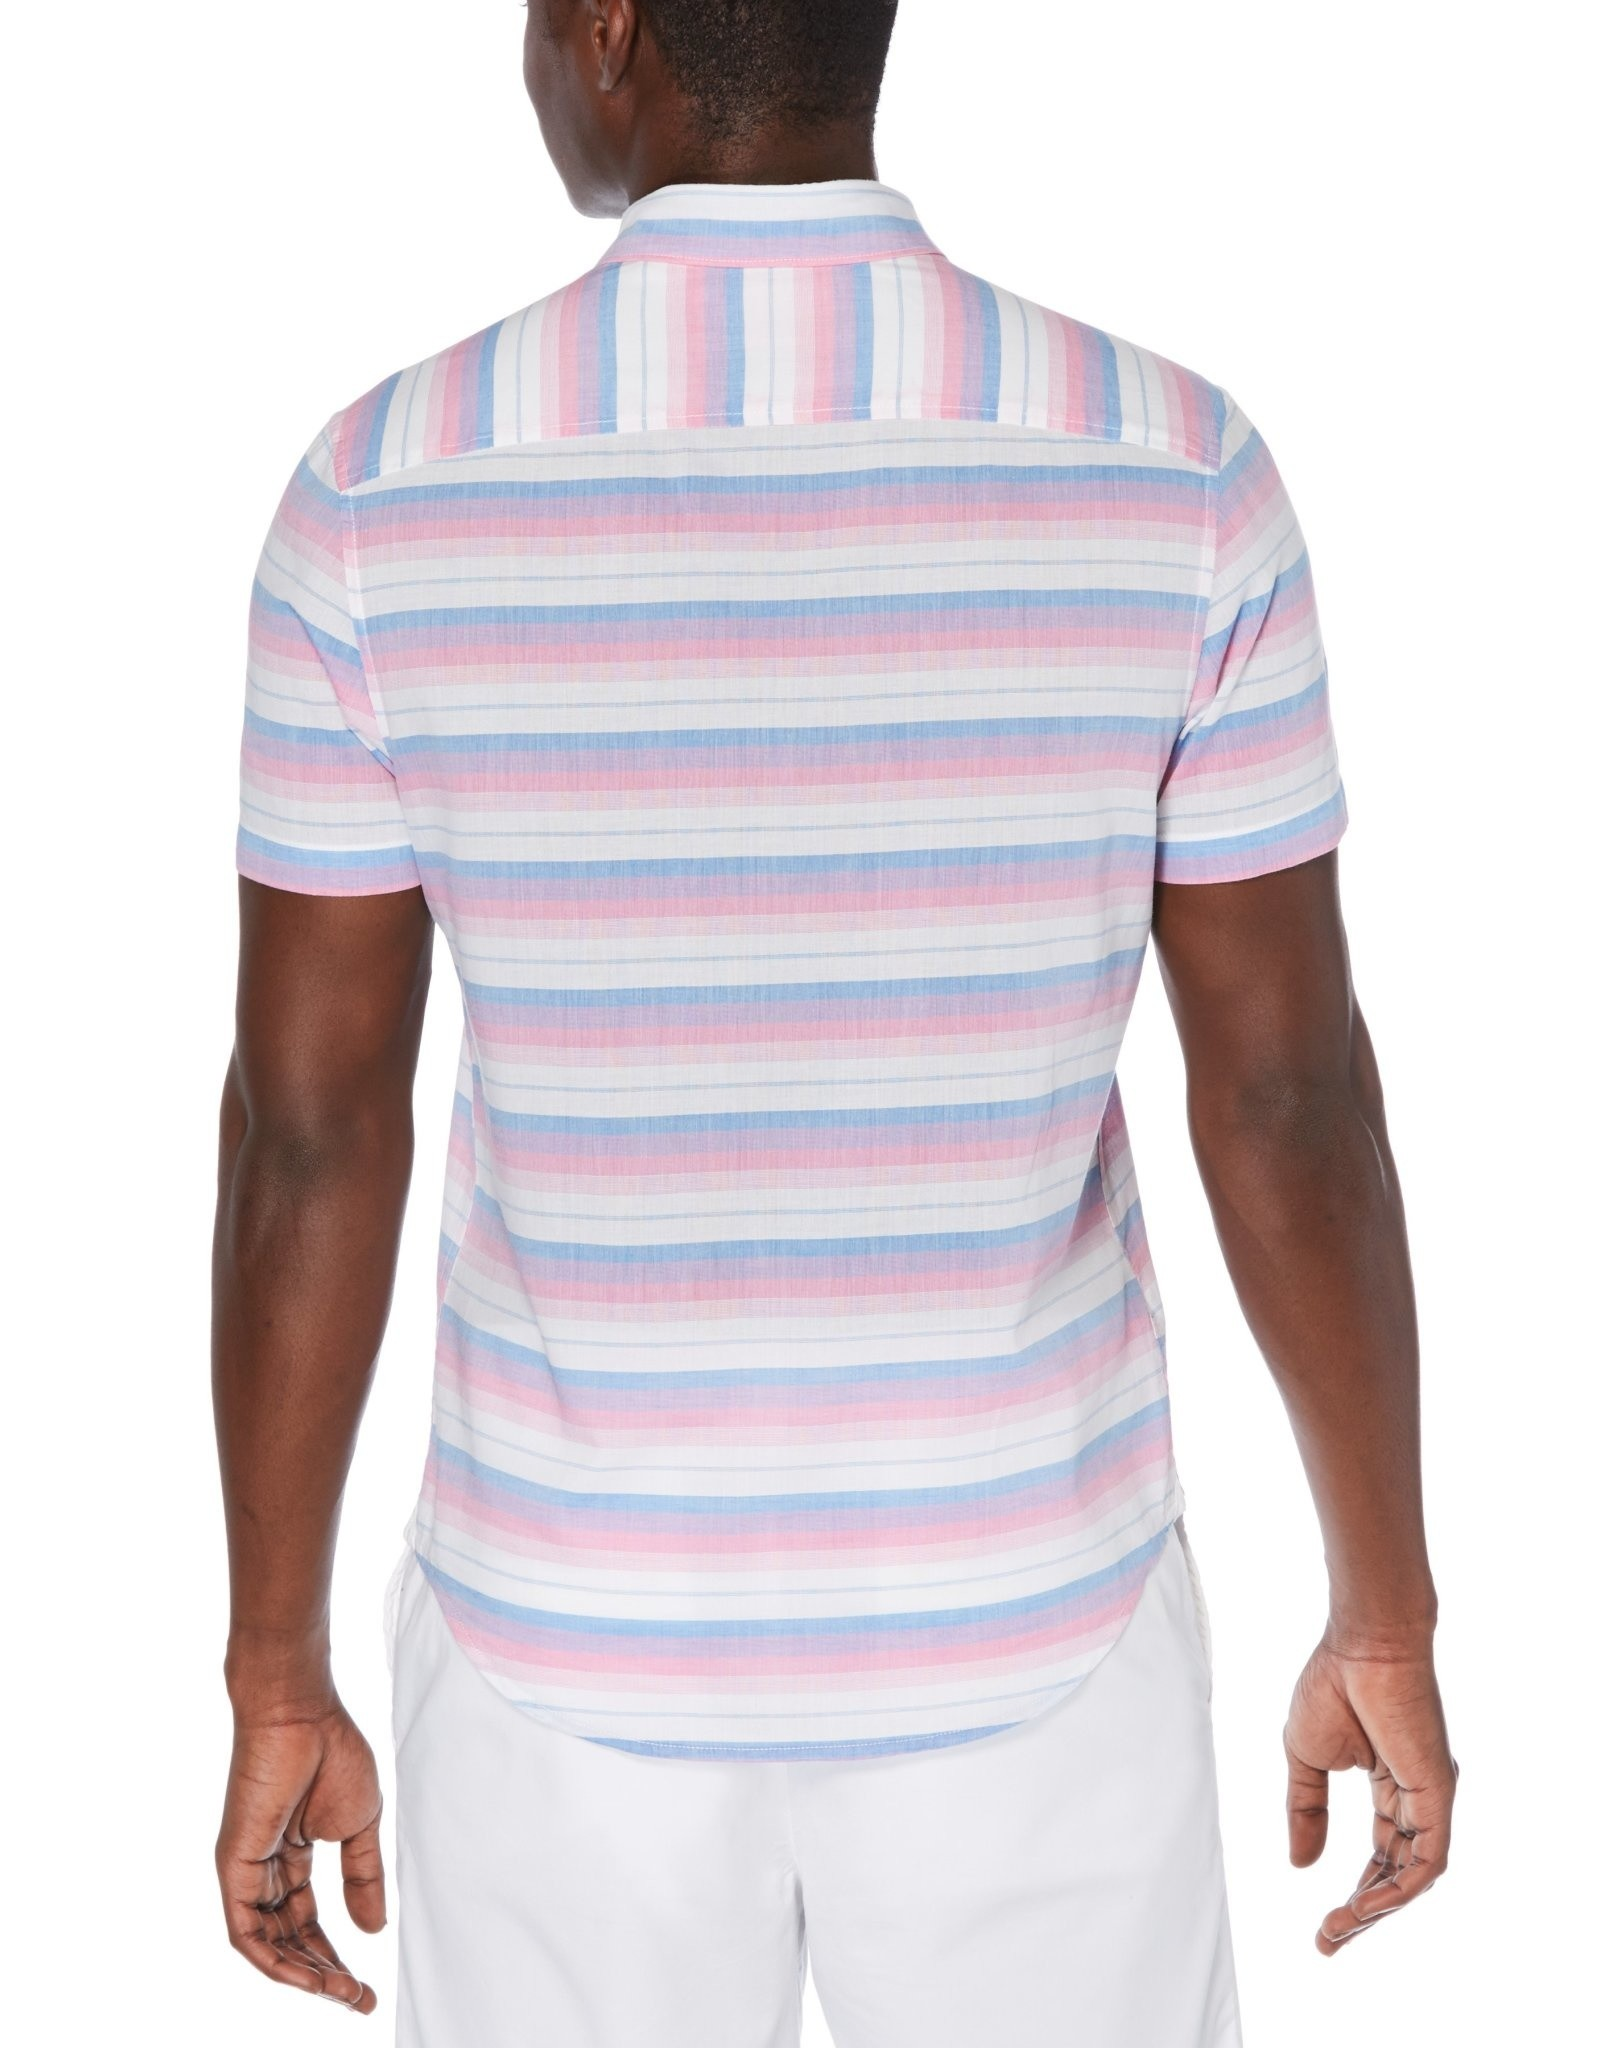 Penguin Horizontal Stripe Shirt